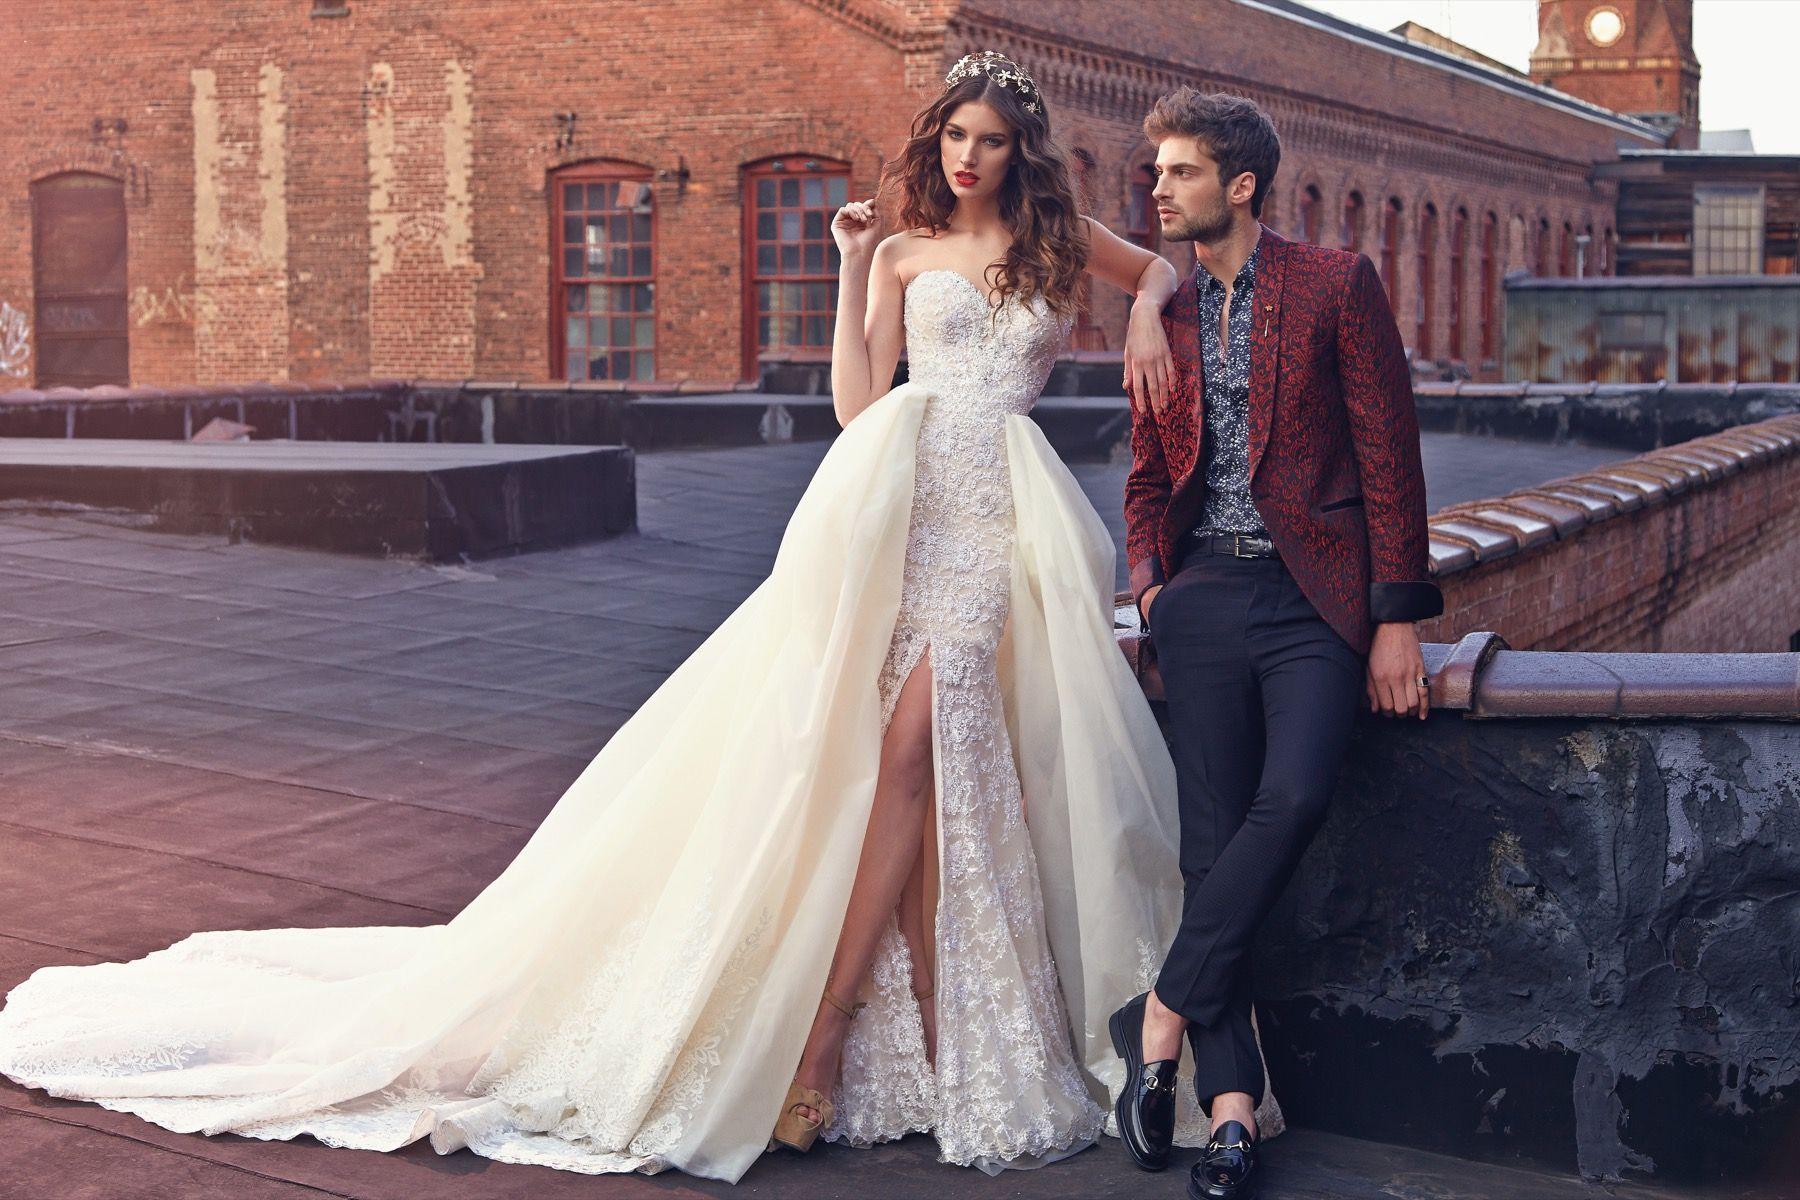 Galialahav the crystal dress is an all embroidered mermaid corset